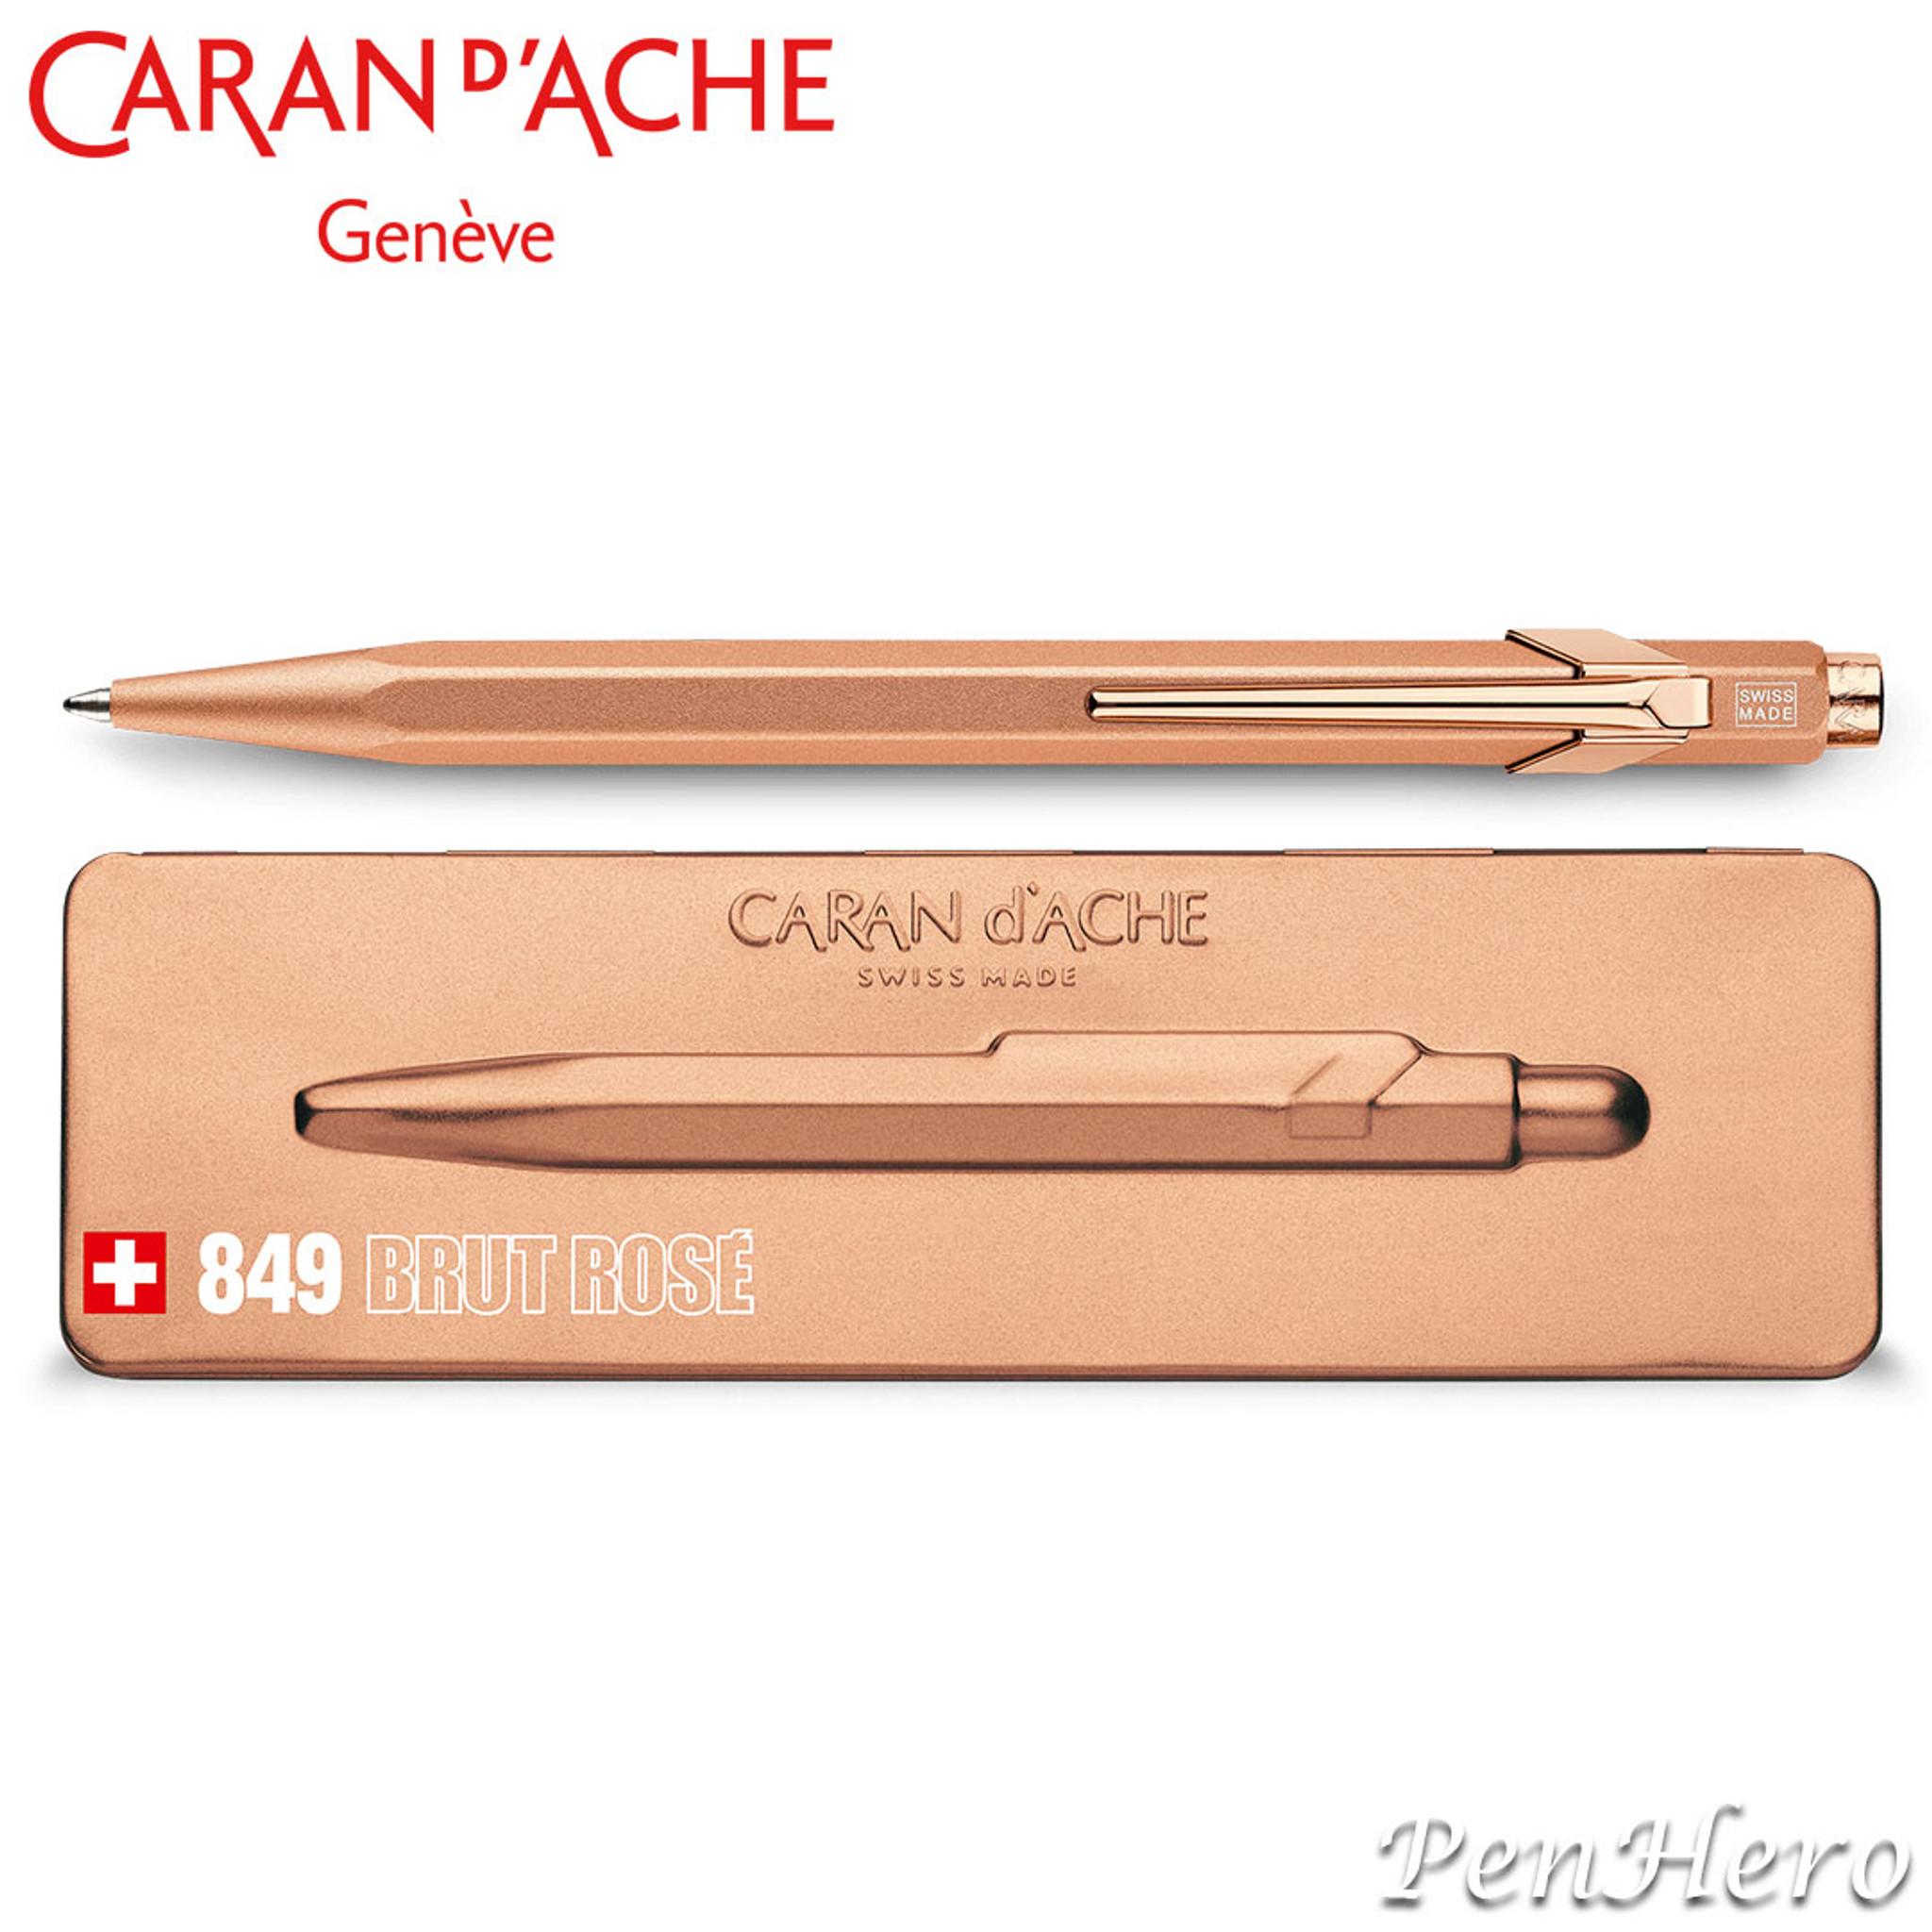 Genuine Caran D/'Ache Brut Rose 849 Ballpoint Pen BNIB